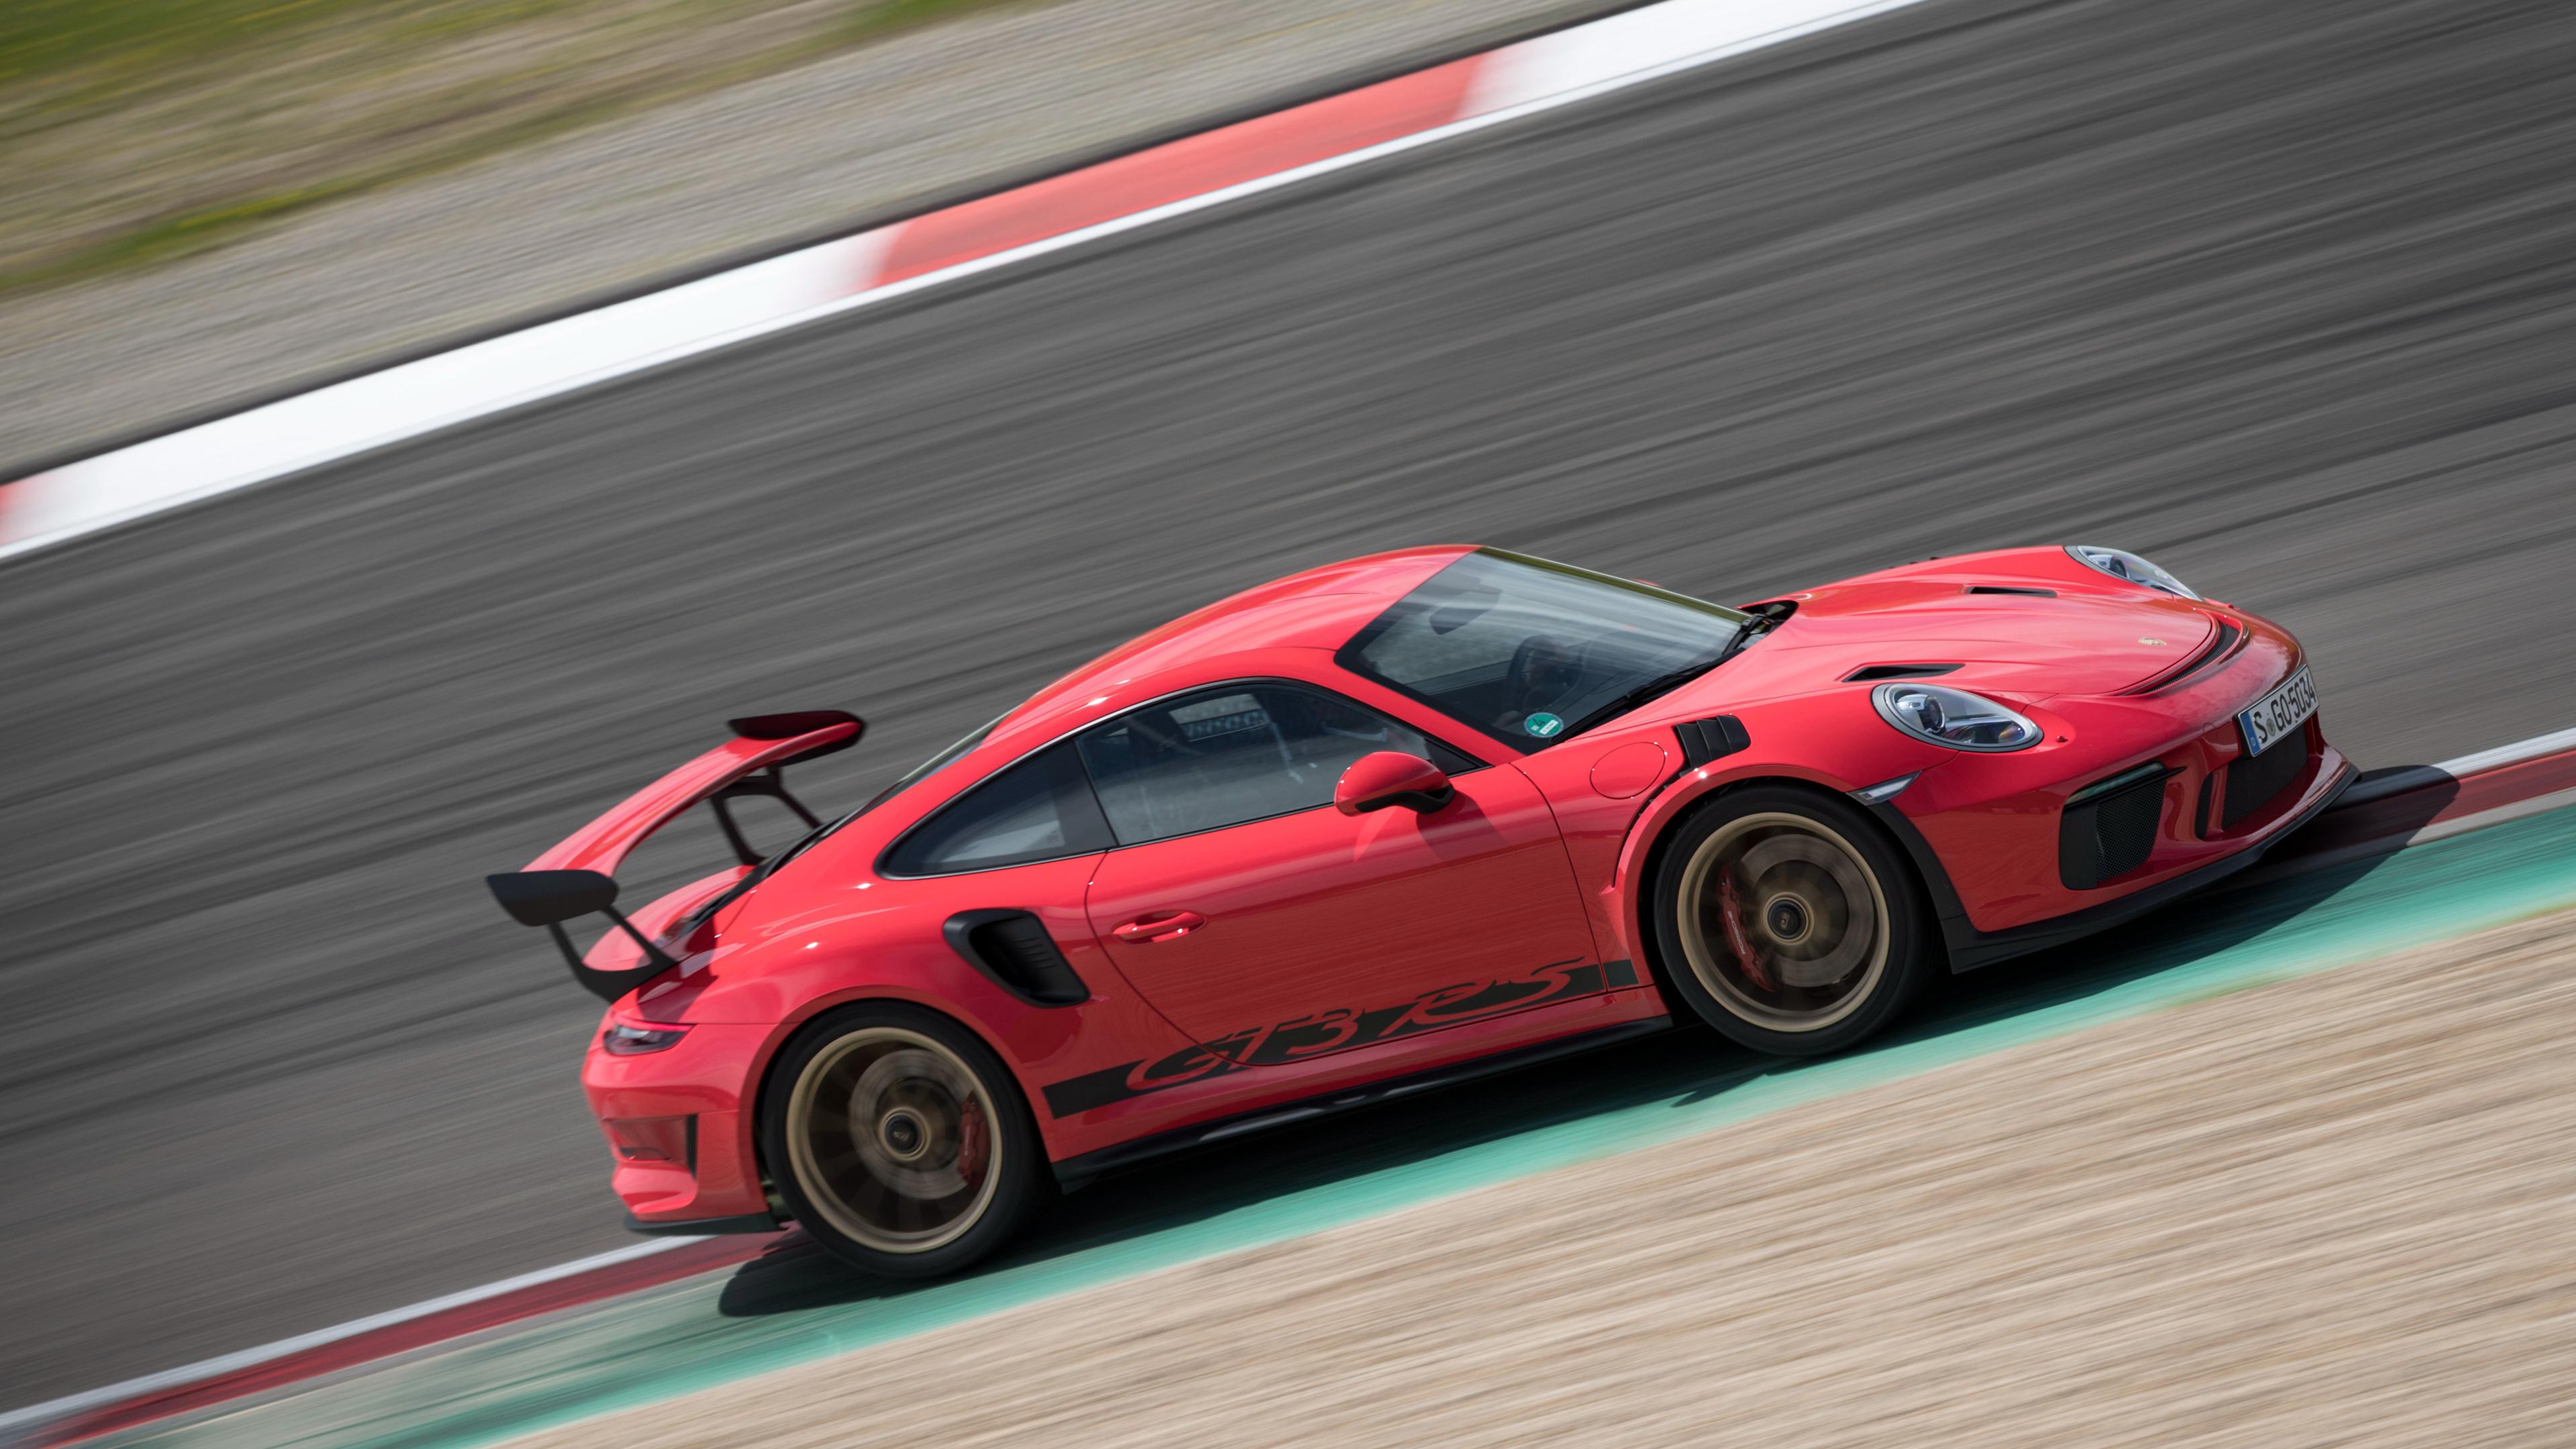 2018 porsche 911 gt3 rs 1539110888 - 2018 Porsche 911 GT3 RS - porsche wallpapers, porsche 911 wallpapers, hd-wallpapers, hd wallpapers2018 cars wallpapers, cars wallpapers, 4k-wallpapers